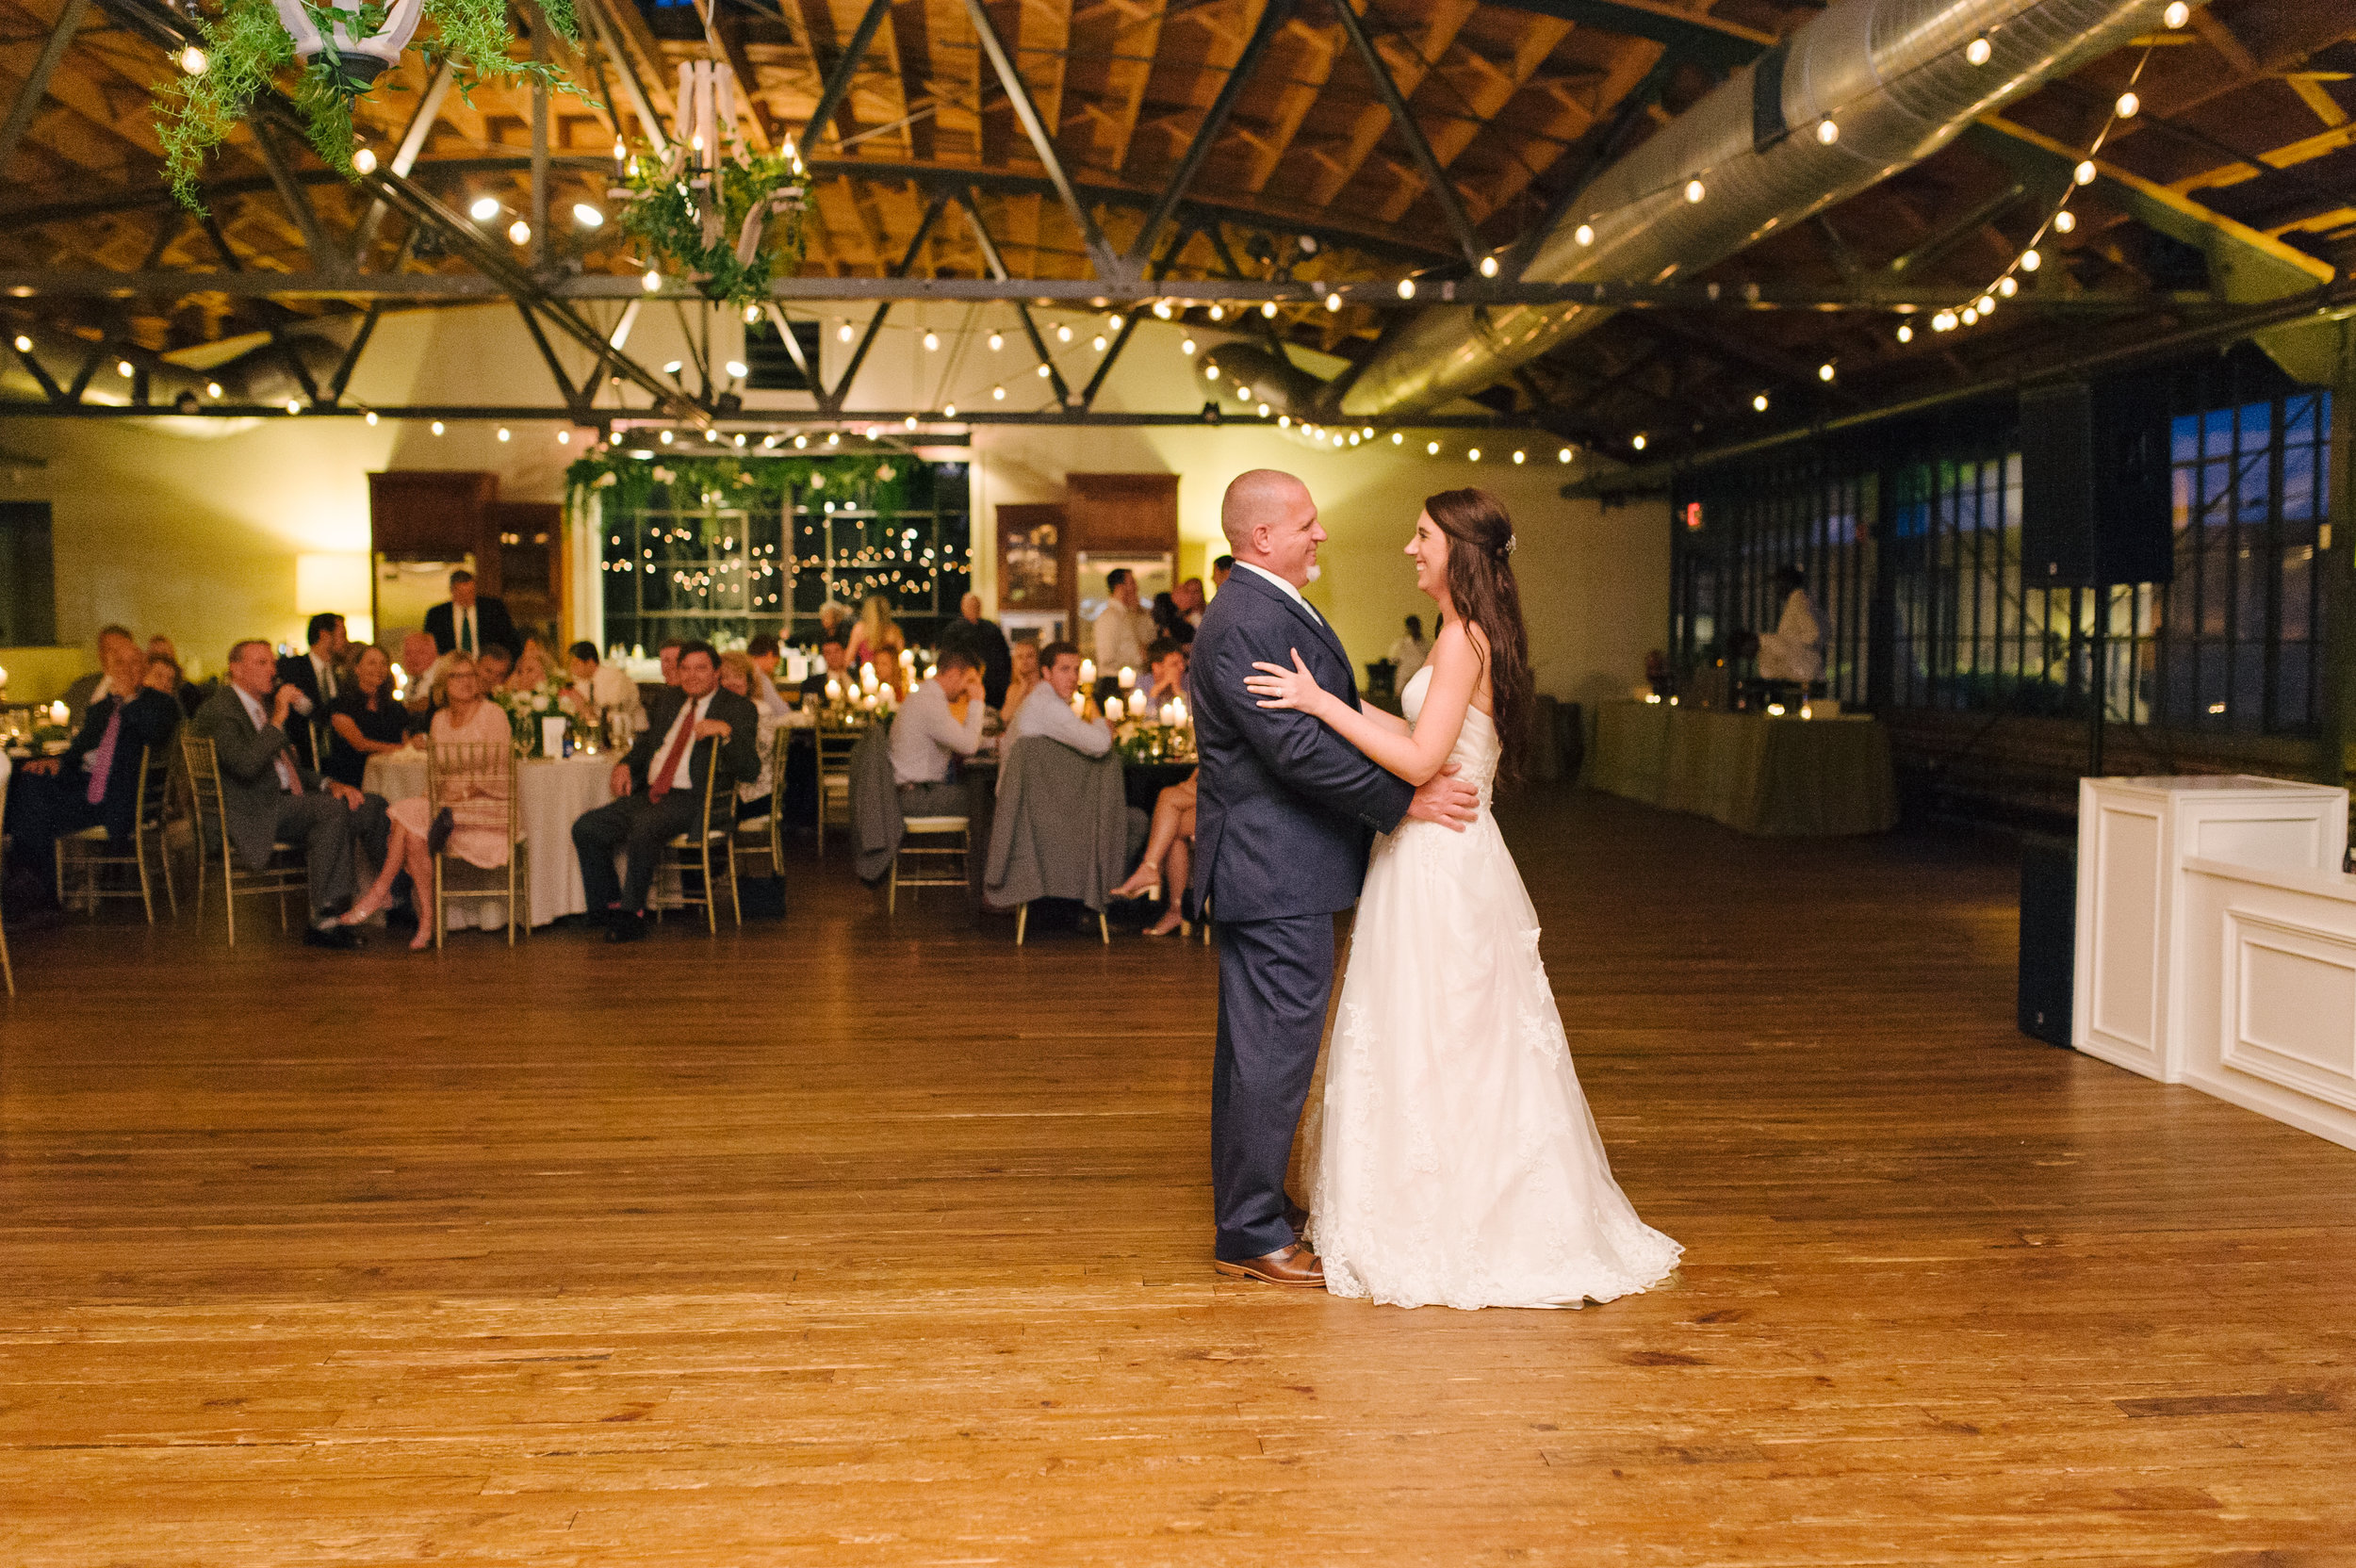 Romantic-Summerour-studio-wedding-hannah-forsberg-atlanta-wedding-photographer88.JPG